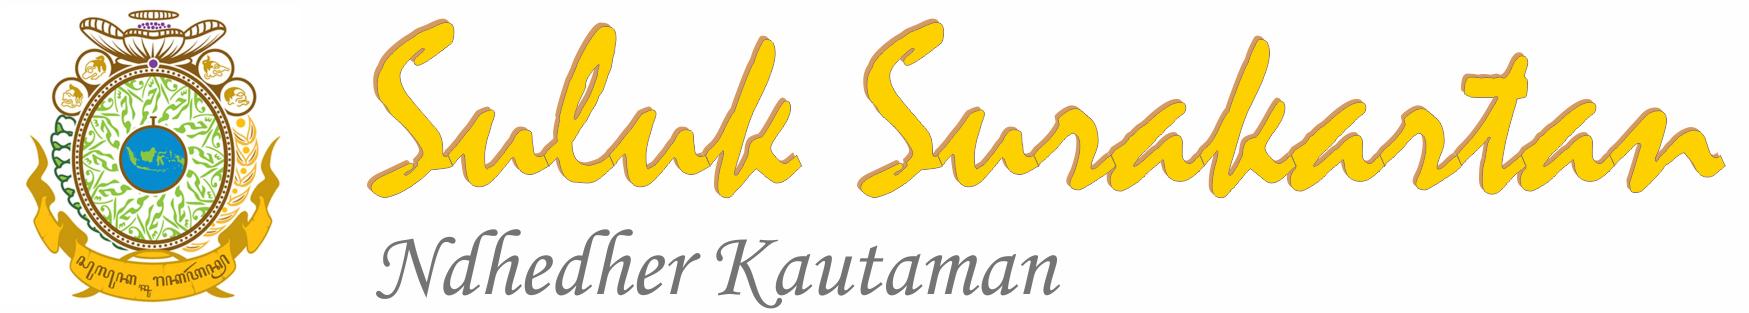 Suluk Surakartan